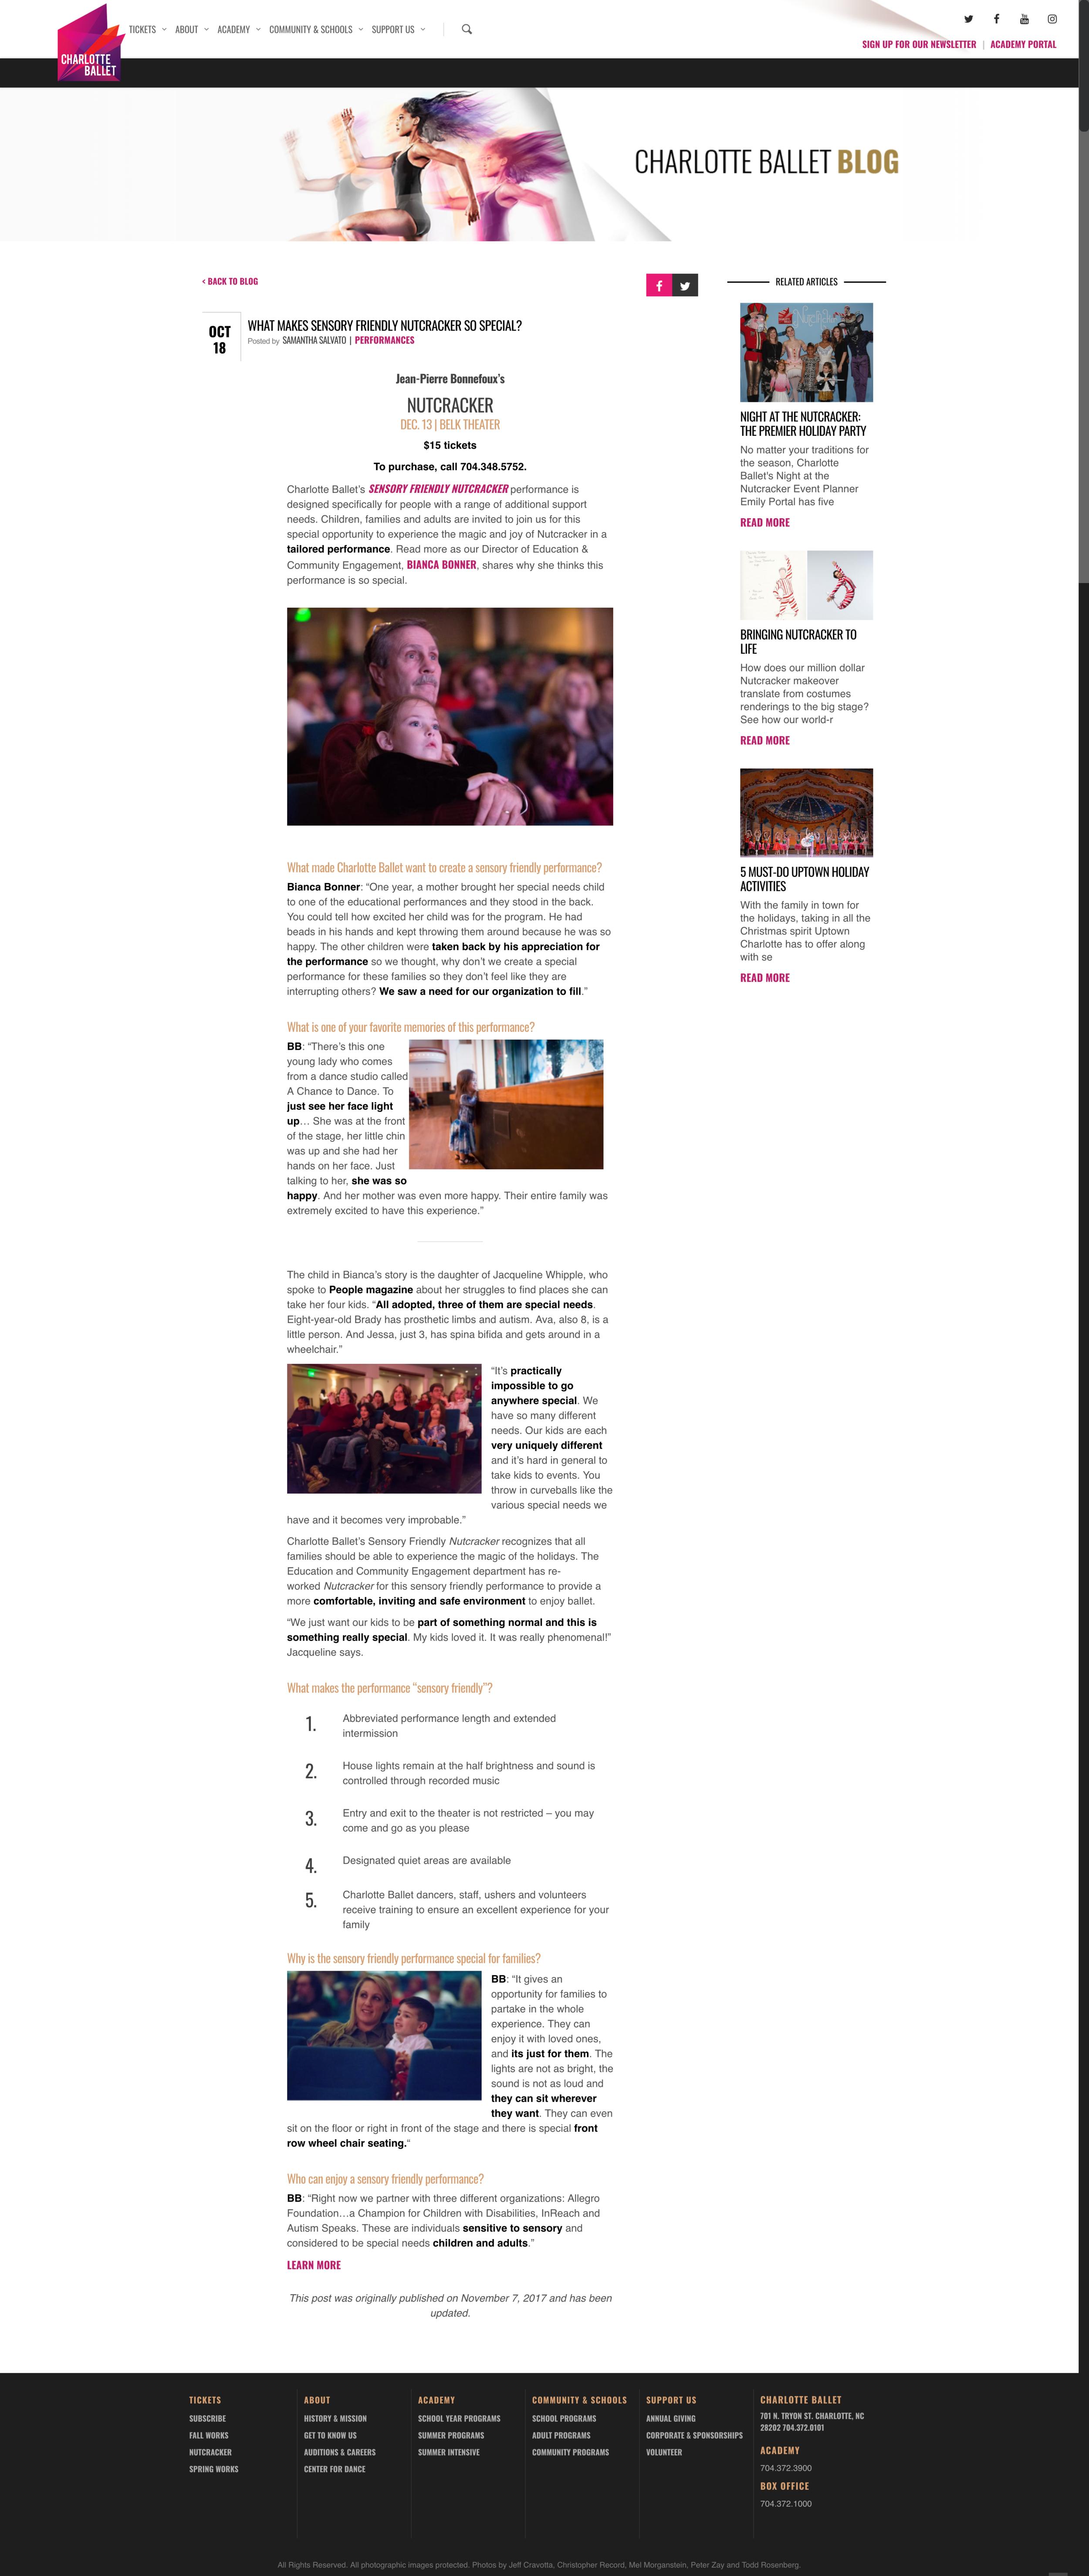 screencapture-charlotteballet-org-what-makes-sensory-friendly-nutcracker-so-special-2019-04-14-12_18_42.png